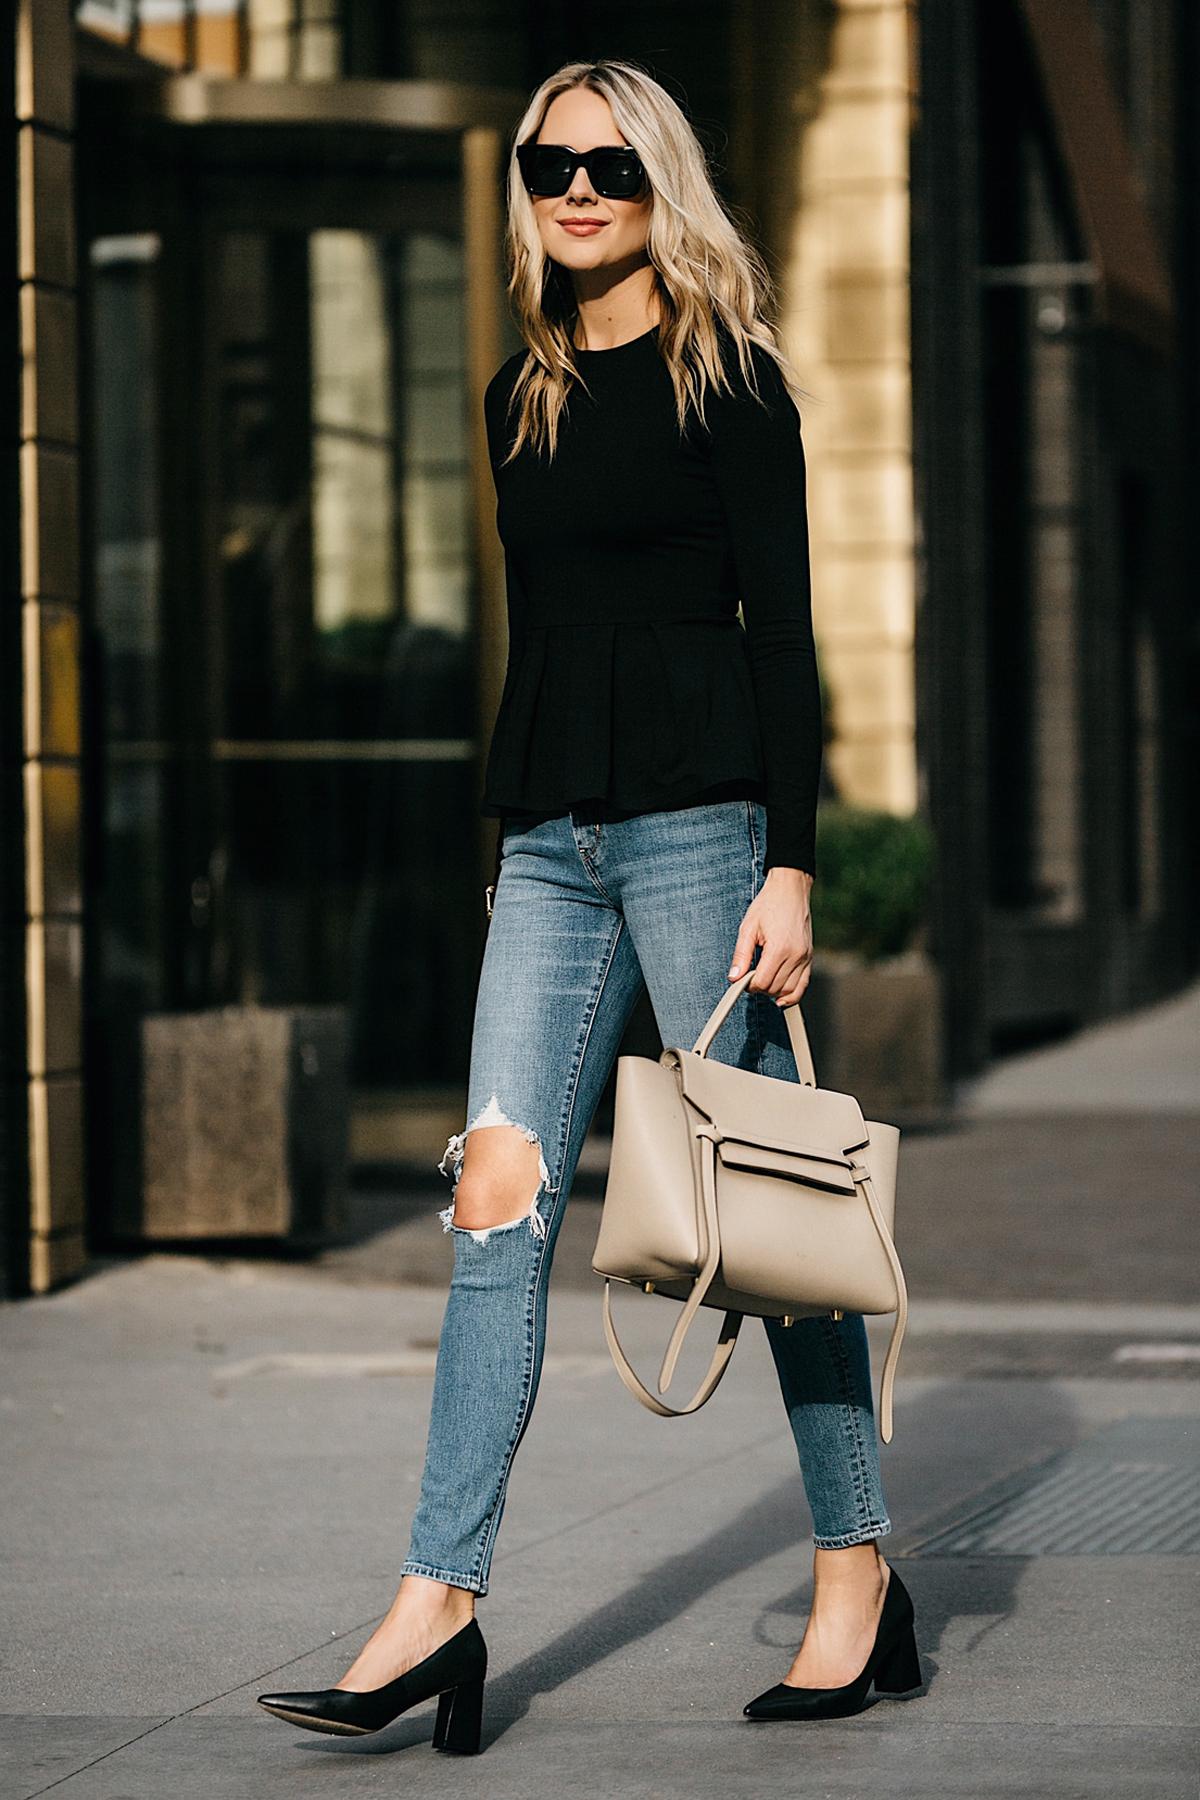 Fashion Fashion Magazine: MY EVERYDAY STYLE